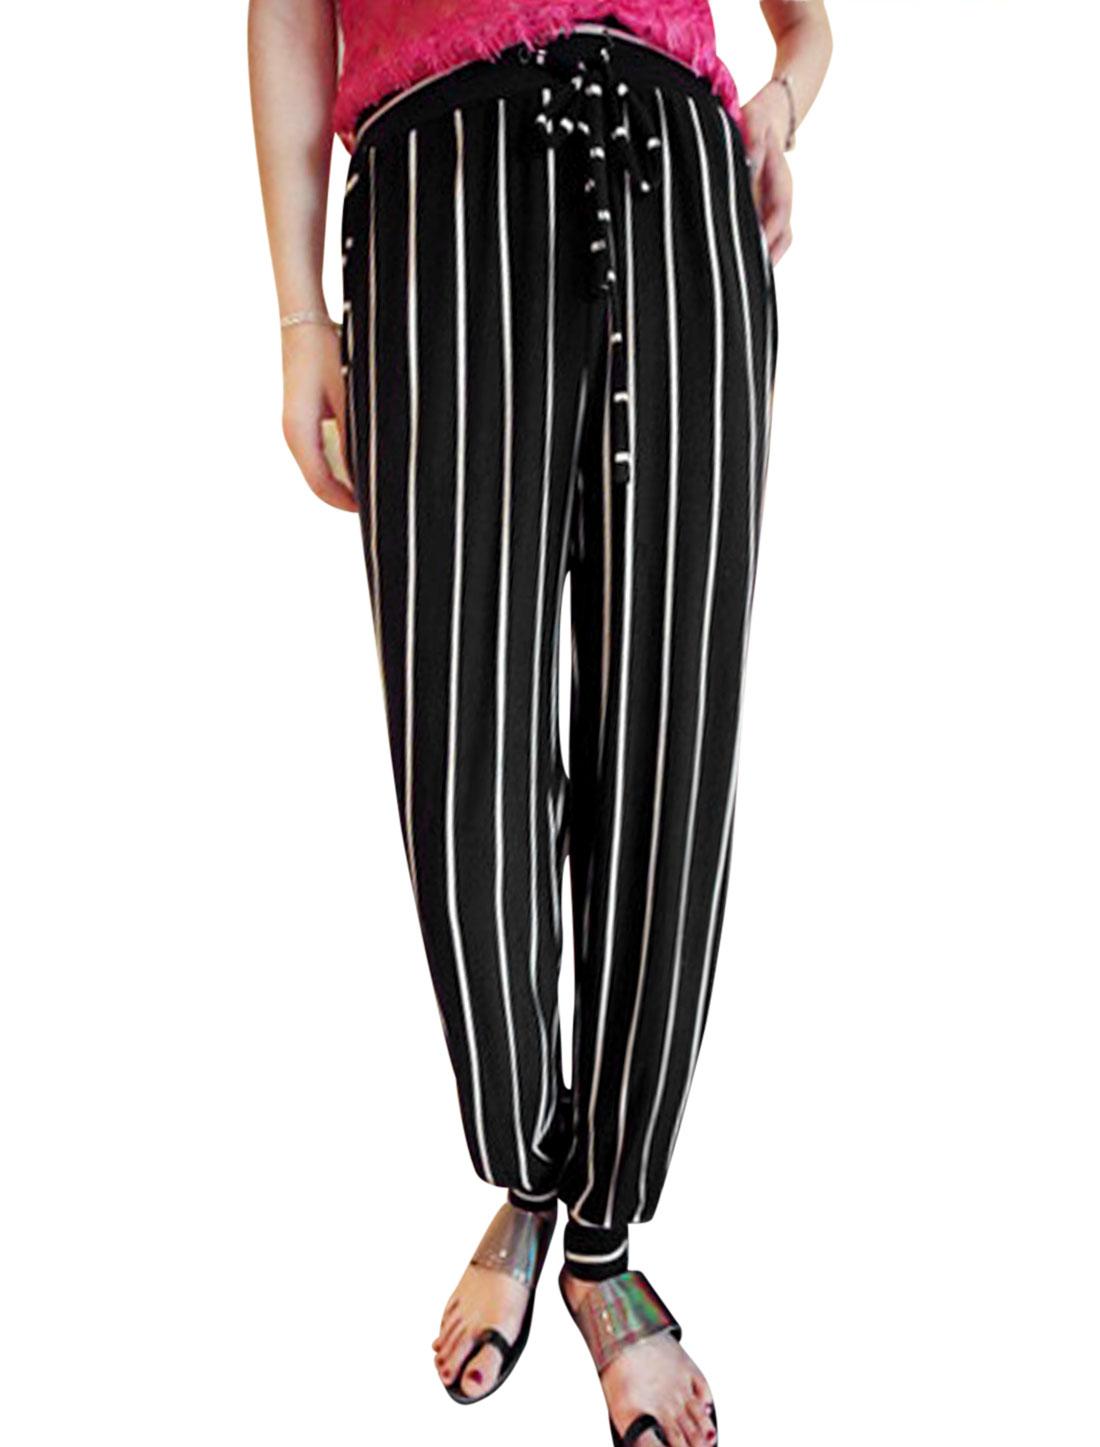 Lady Elastic Drawstring Waist Stripes Tight Cuffs Casual Pants Black XS